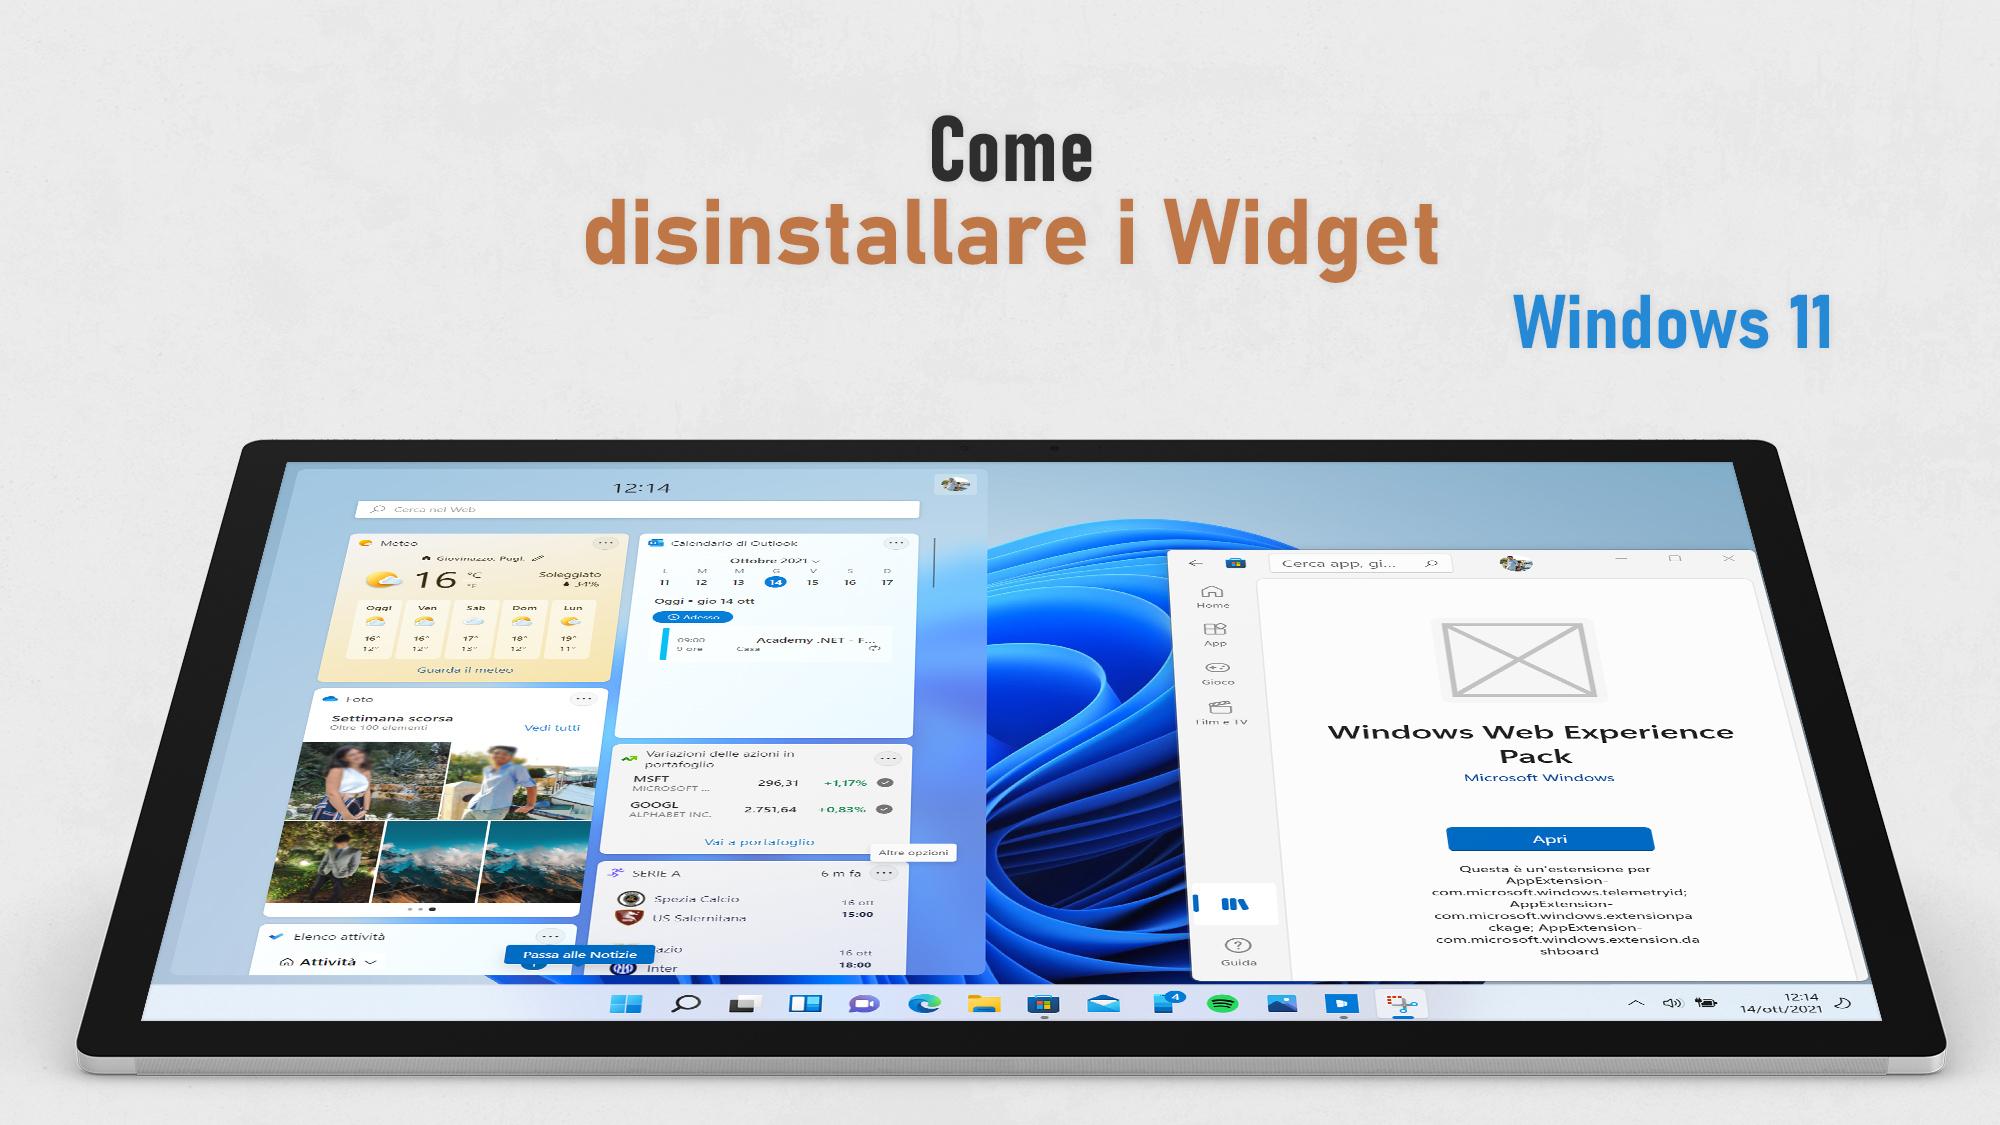 Windows 11 - Come disinstallare i Widget